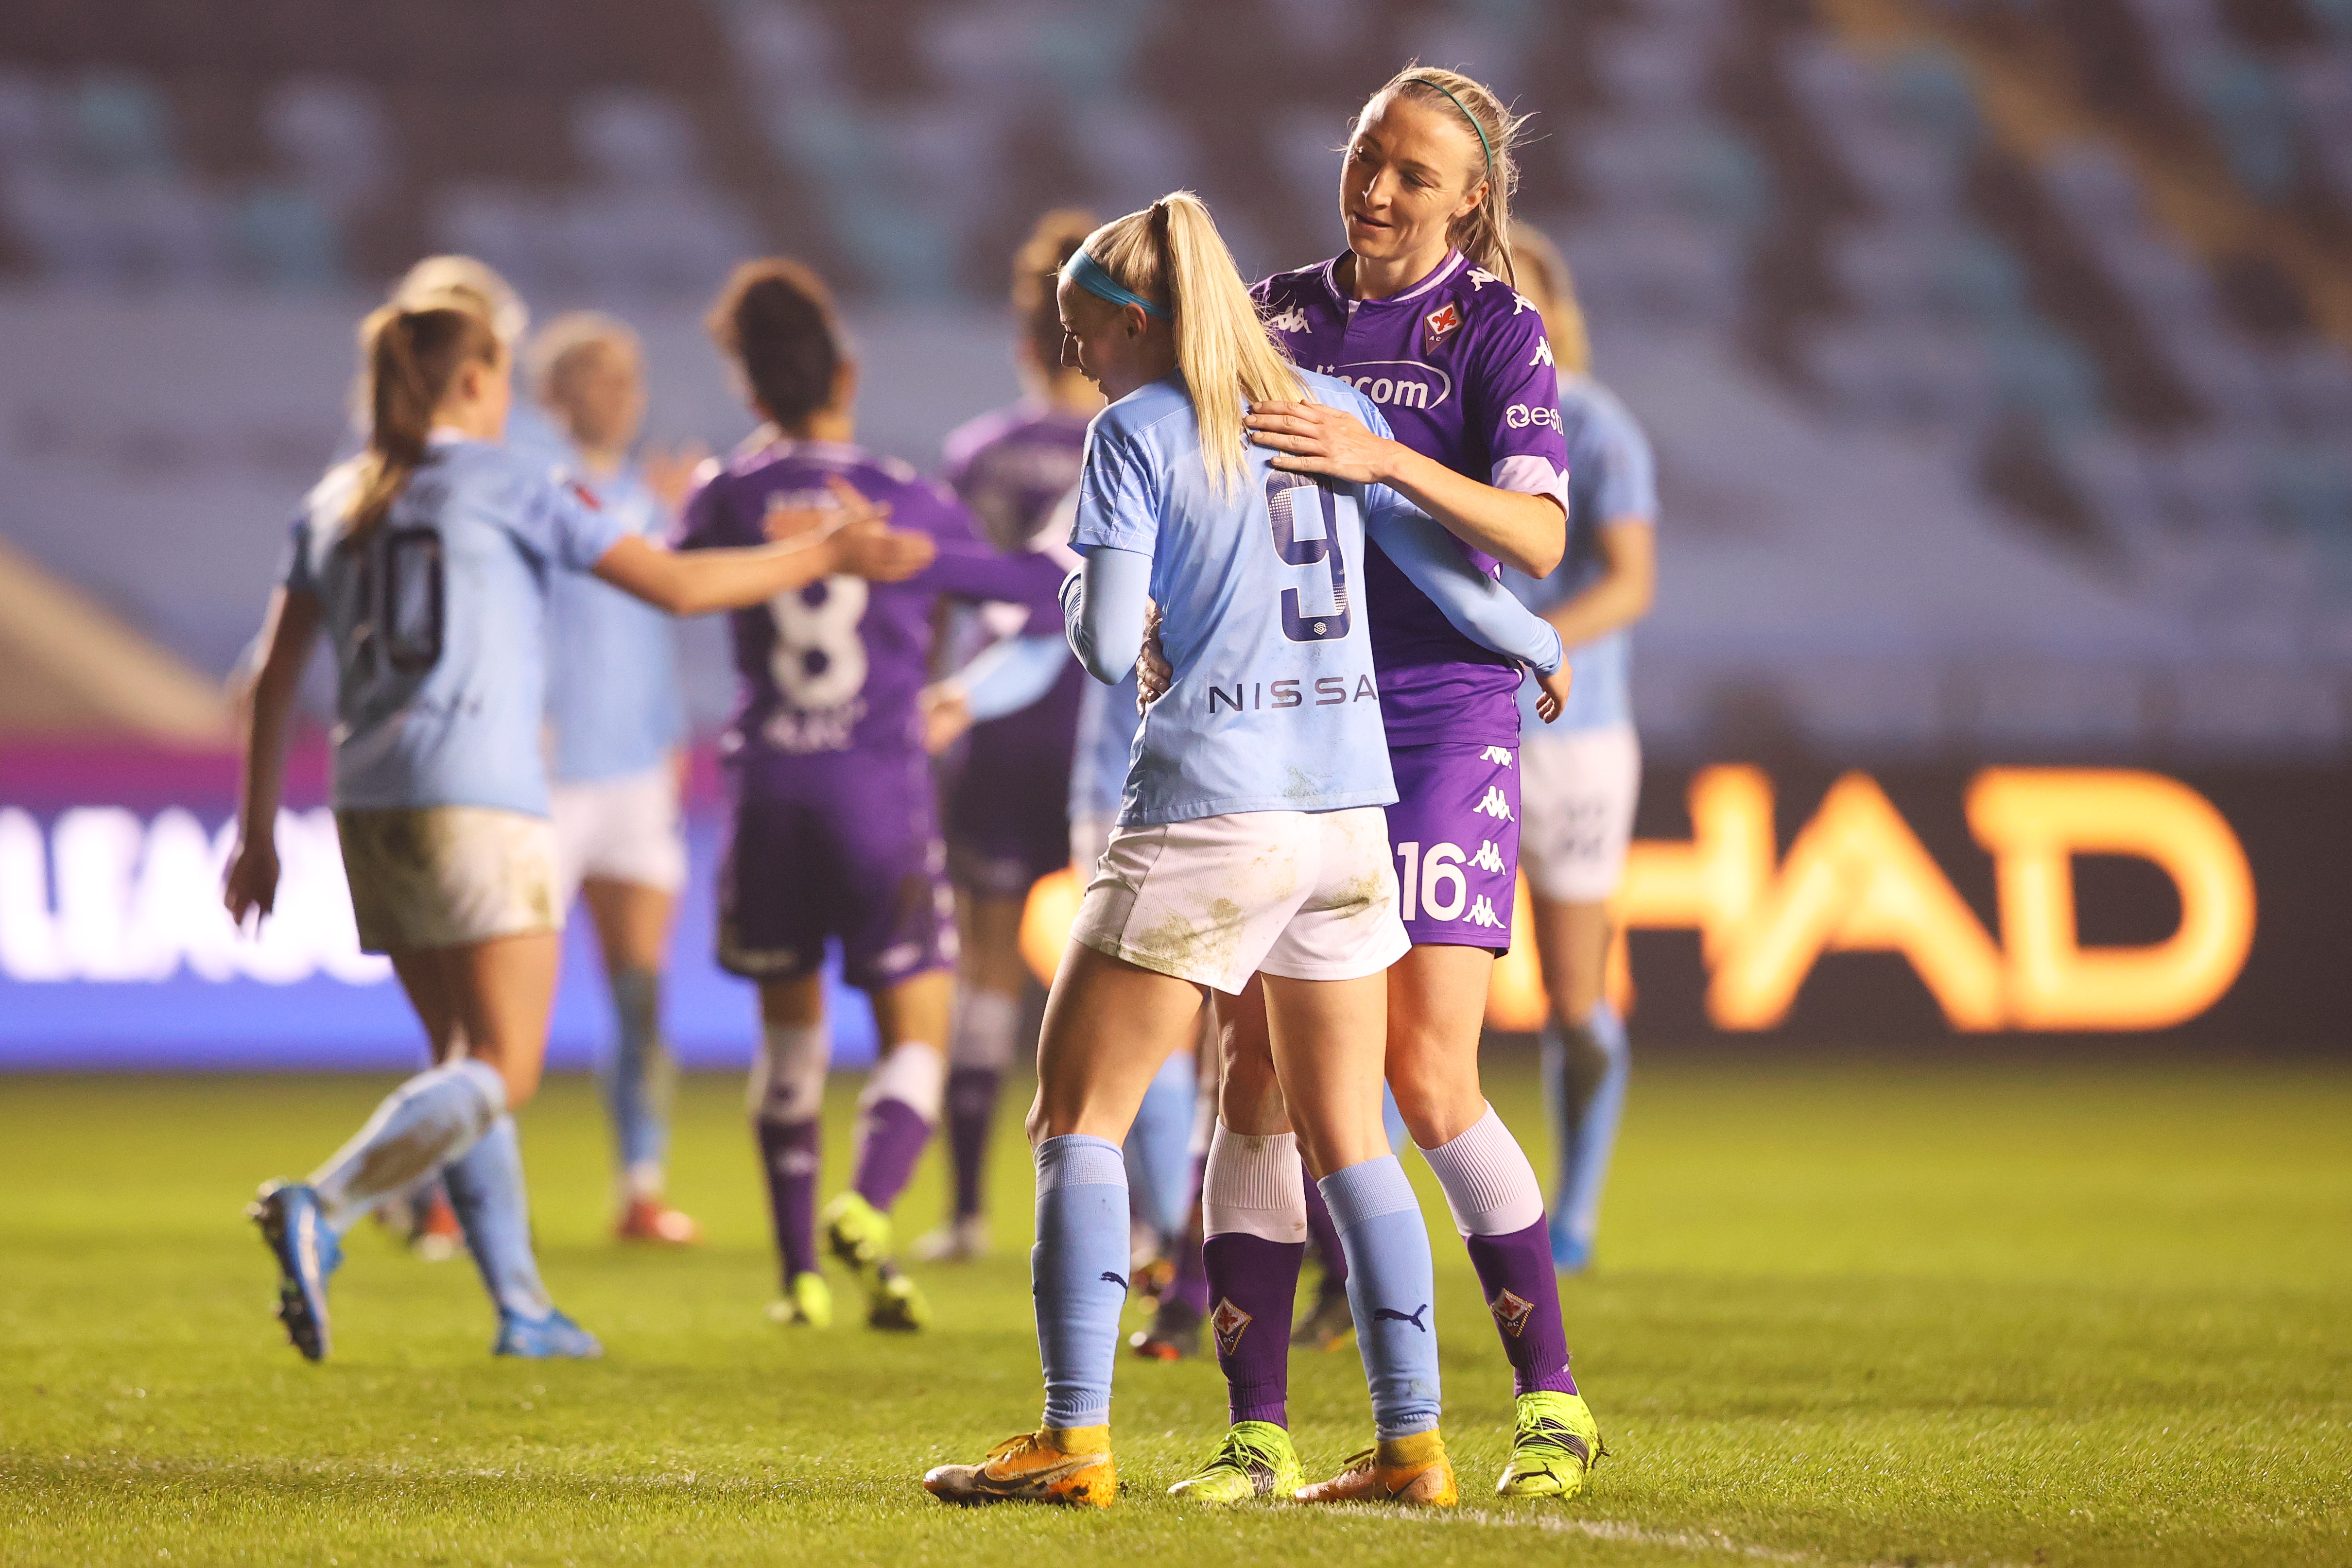 Manchester City WFC v ACF Fiorentina - Women's UEFA Champions League Round Of 16 Leg One